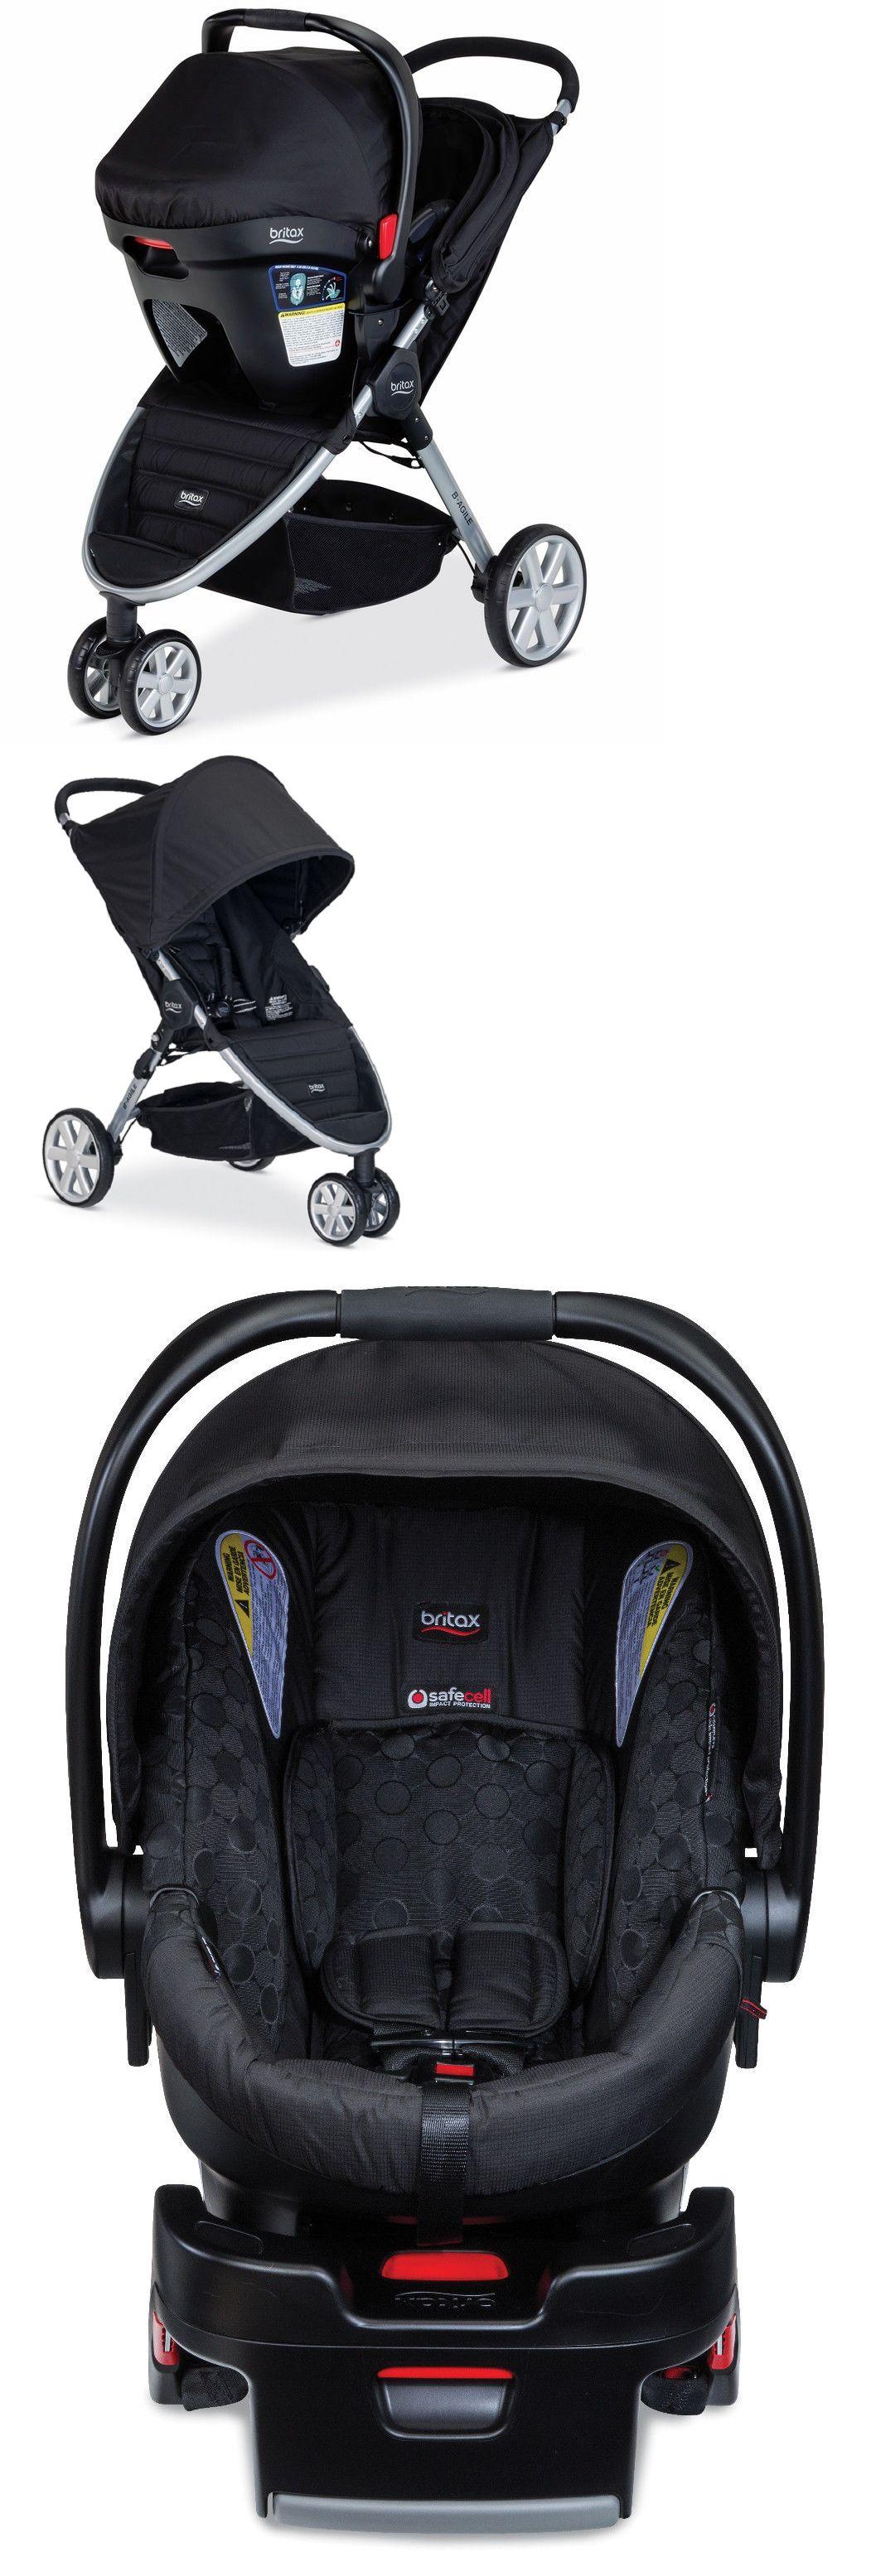 Britax 2015 BAgile 3 Stroller & BSafe 35 Car Seat Travel